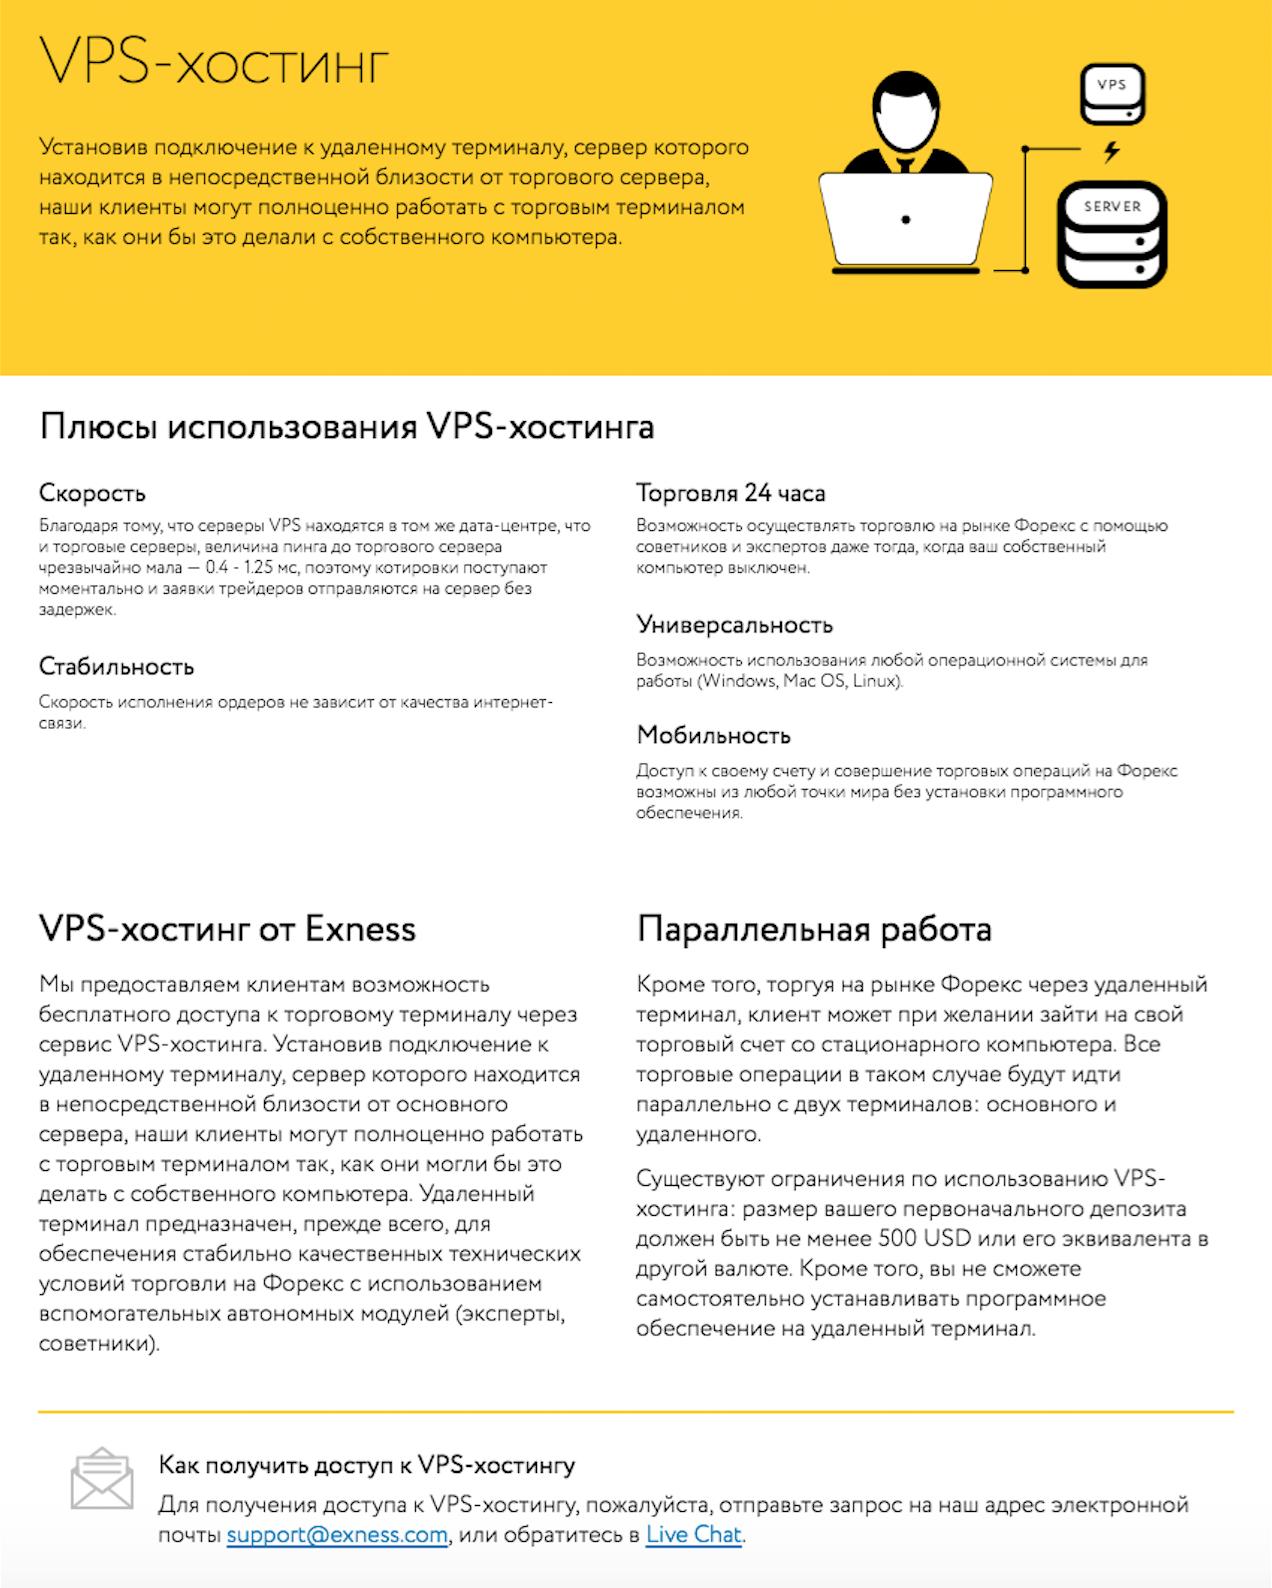 VPS хостинг от Exness